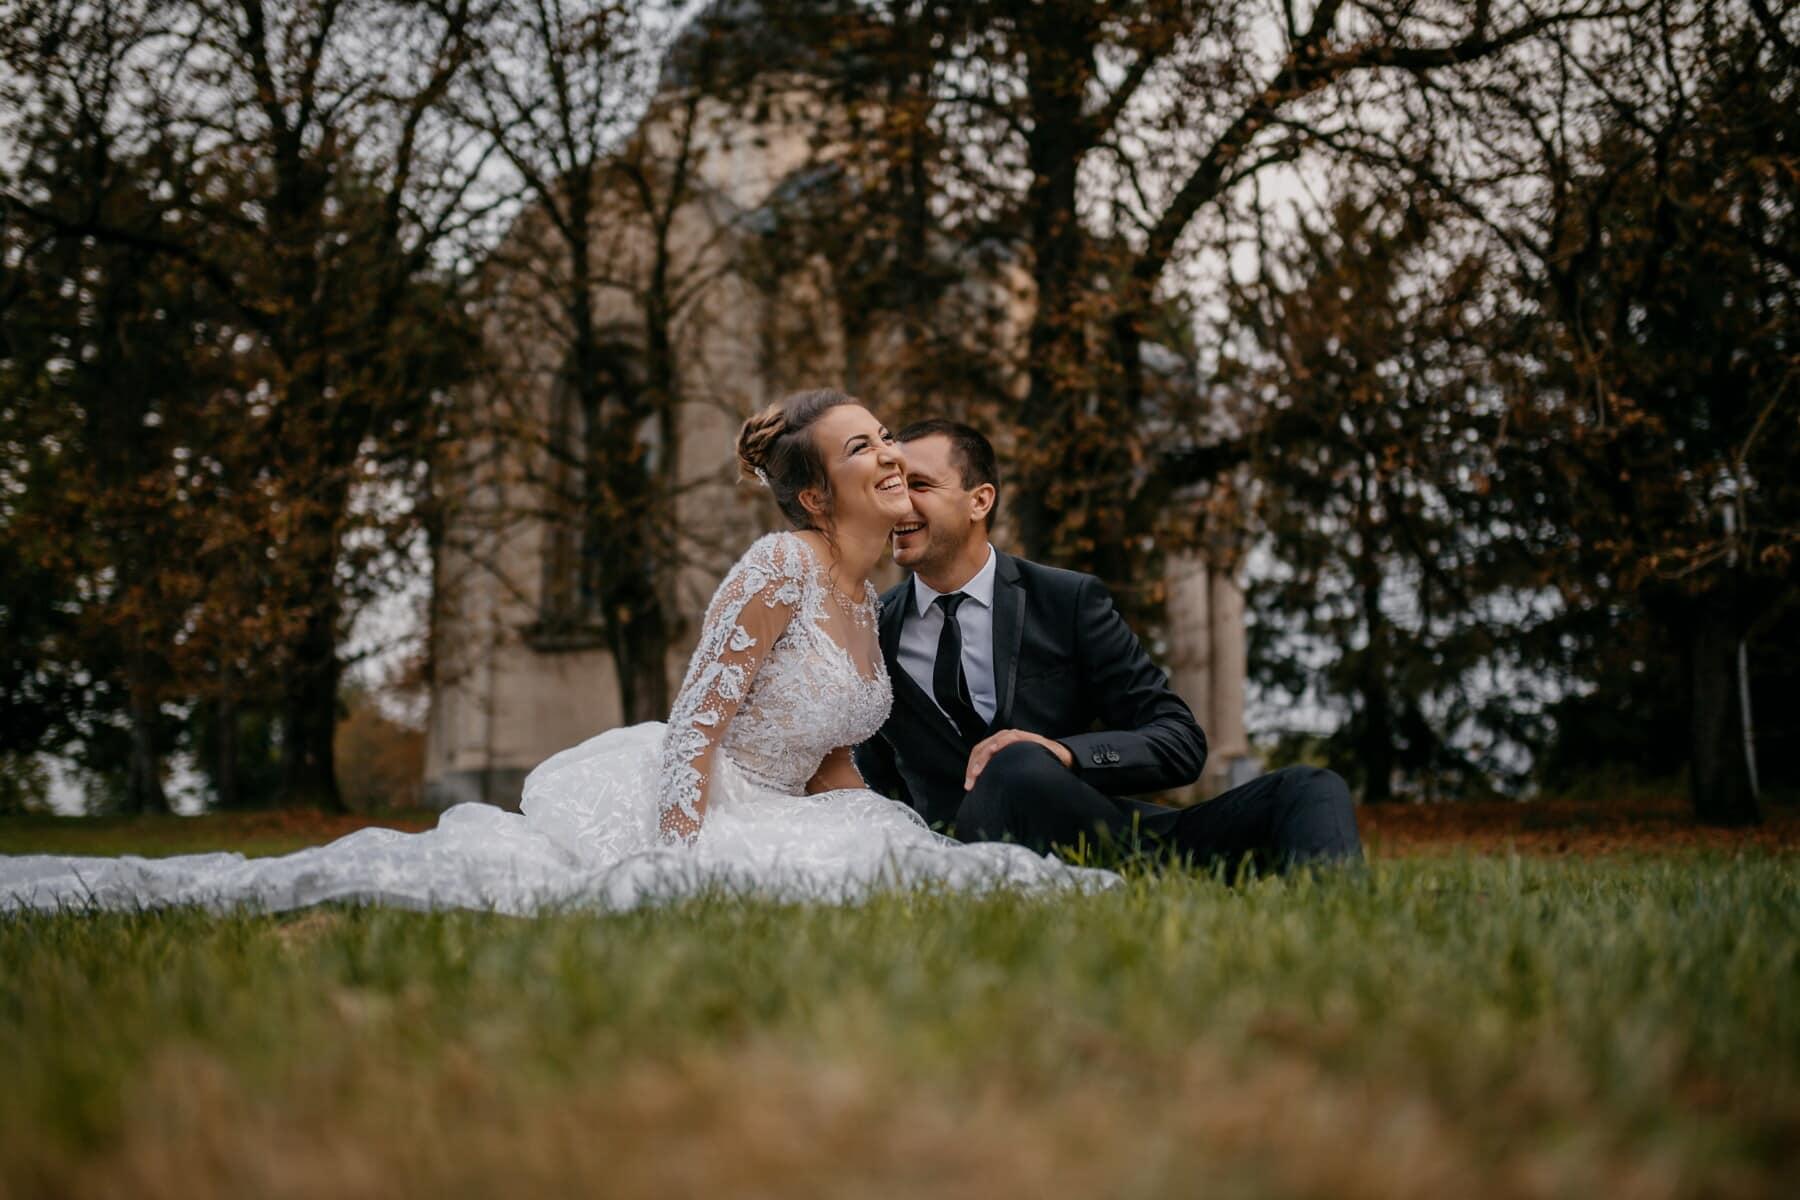 bride, smiling, lawn, sitting, groom, love, girl, park, man, couple